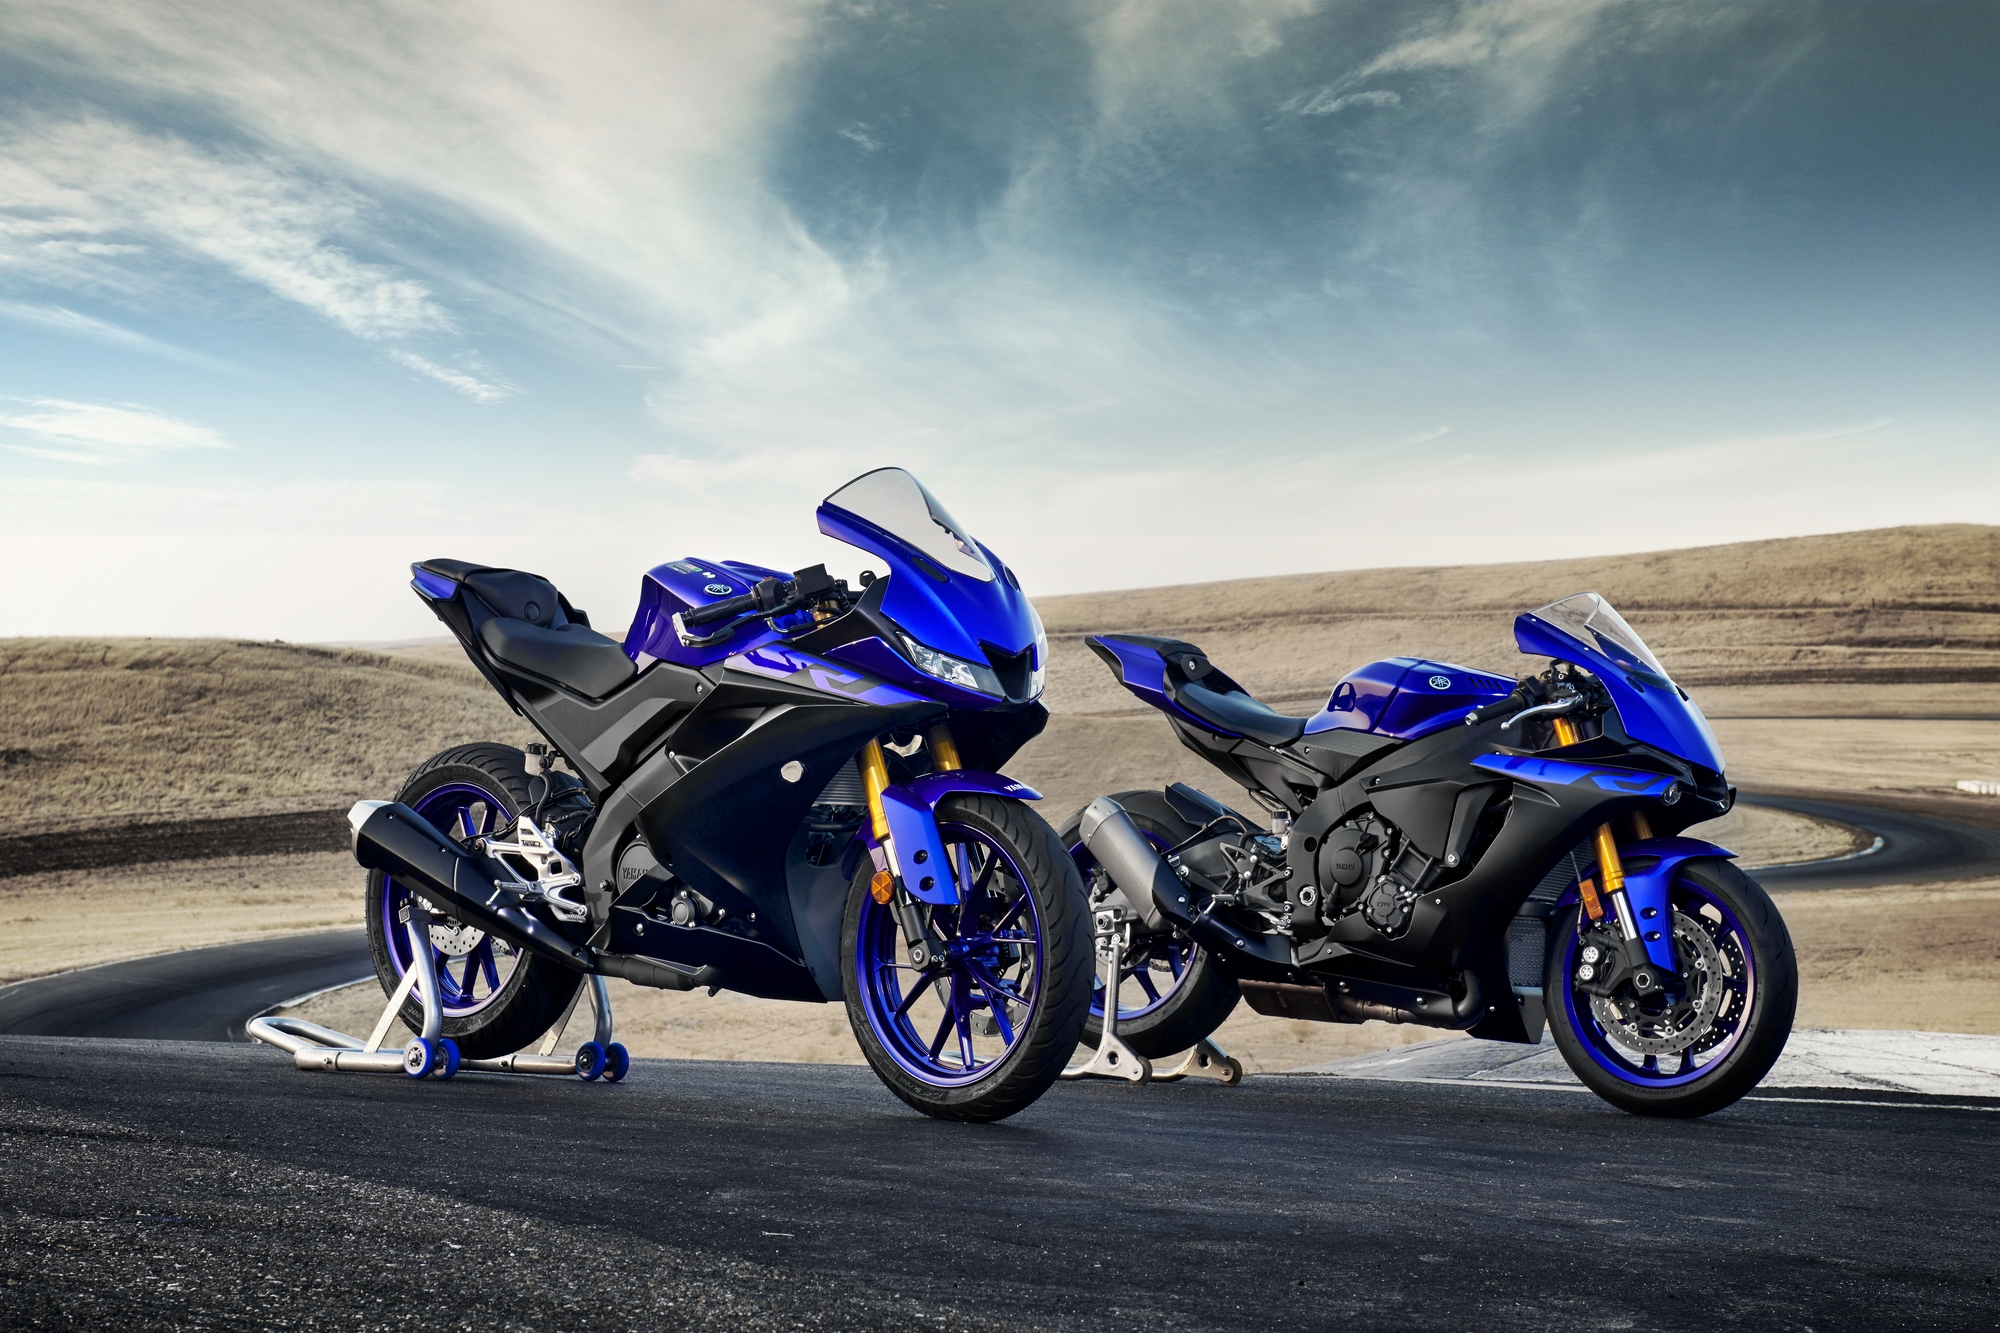 Yzf R125 Motorcycles Yamaha Motor